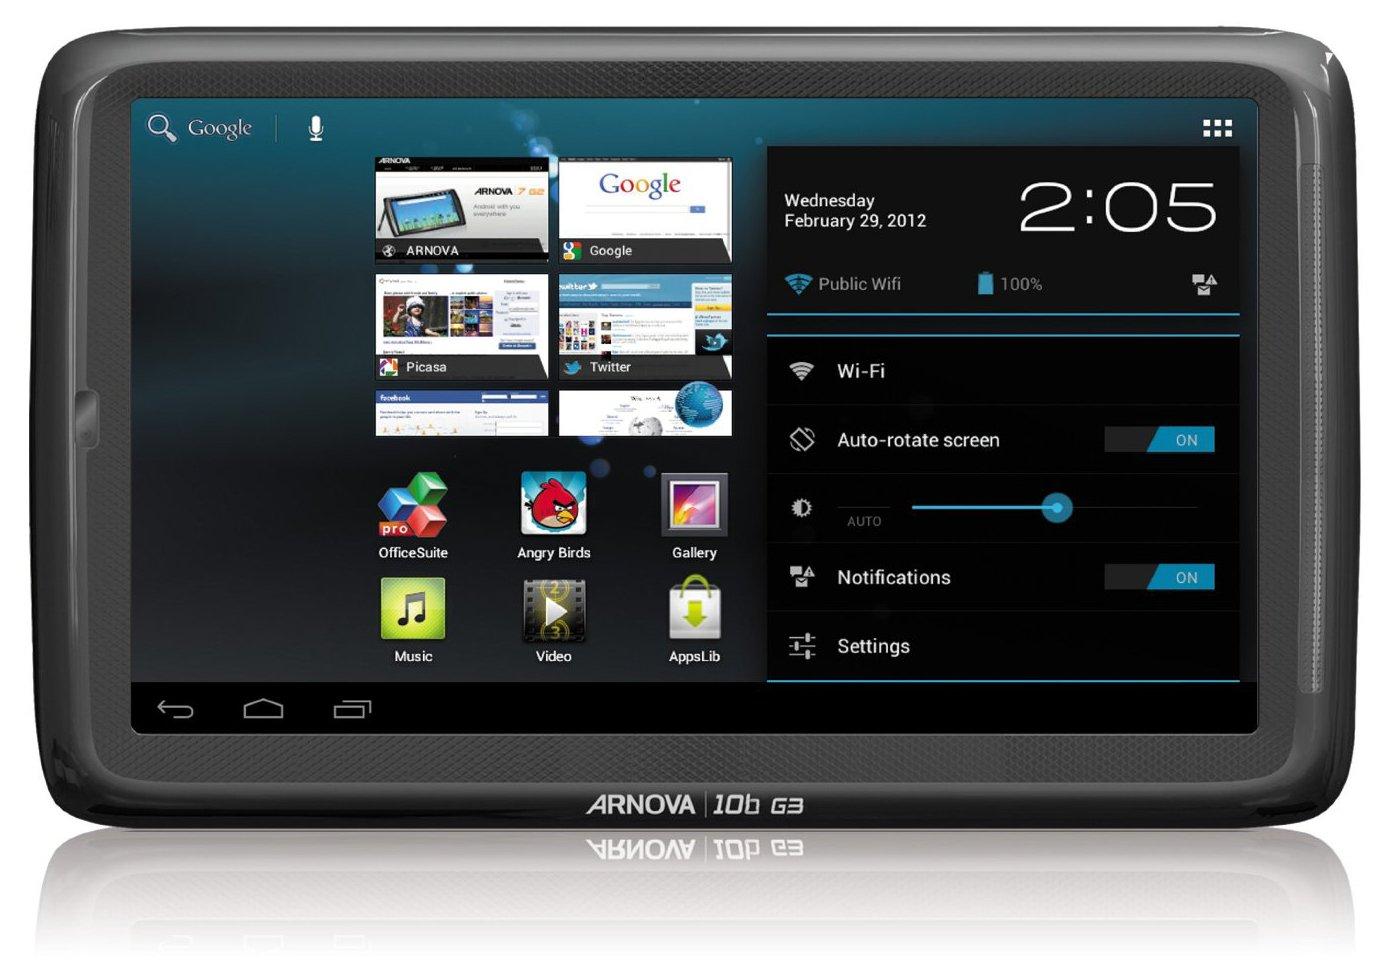 amazon com arnova 10b g3 4gb 10 inch ics tablet black computers rh amazon com